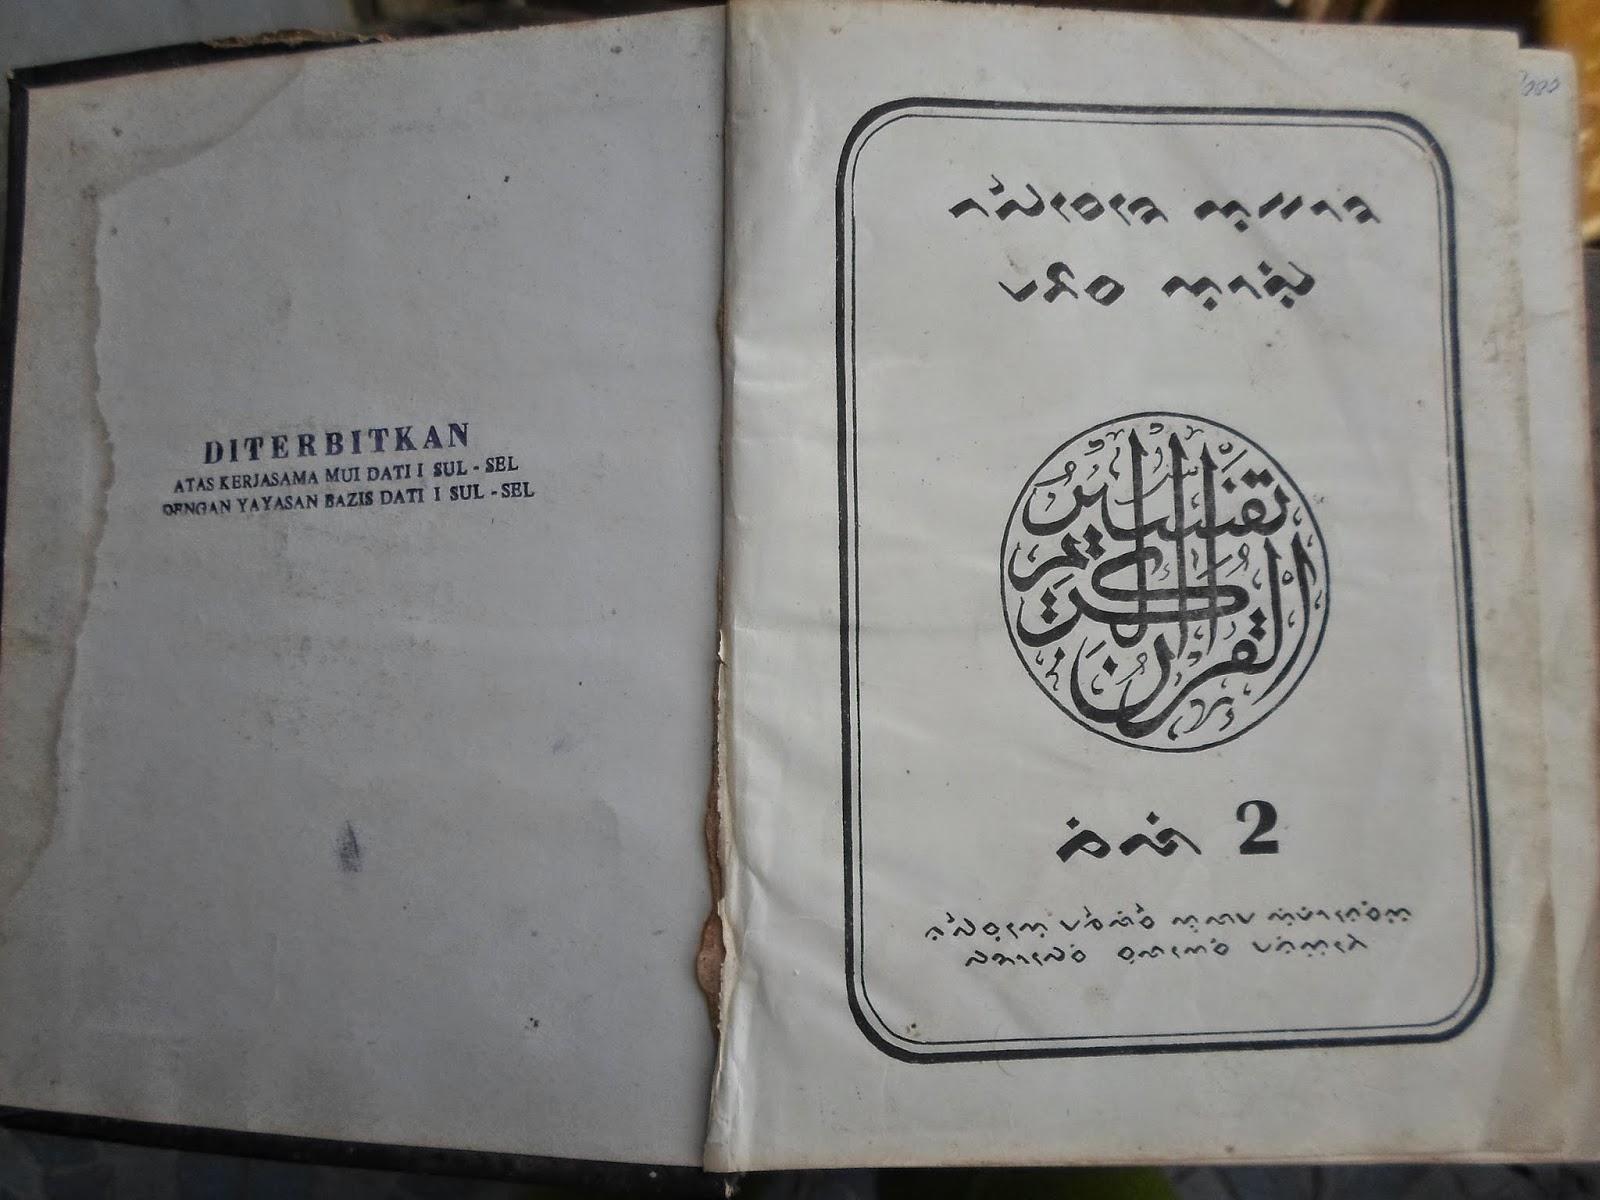 Naskah Bugis Tafsir Al Qur An Dalam Bahasa Bugis